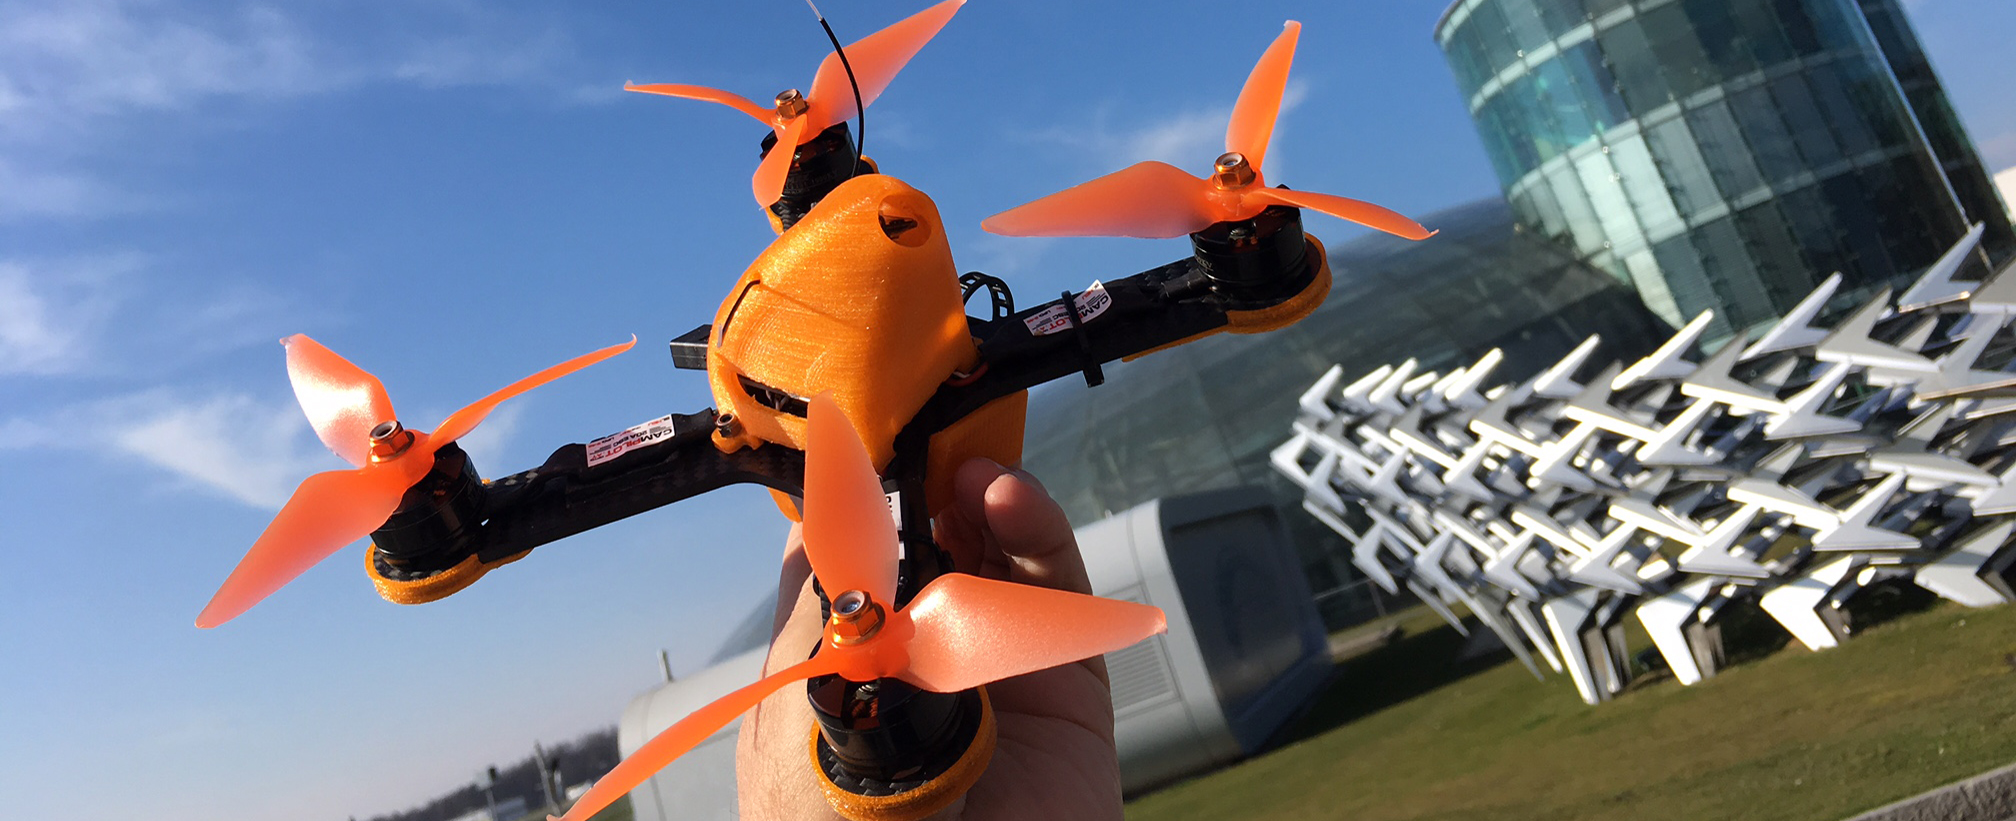 FPV RACING - drone racing